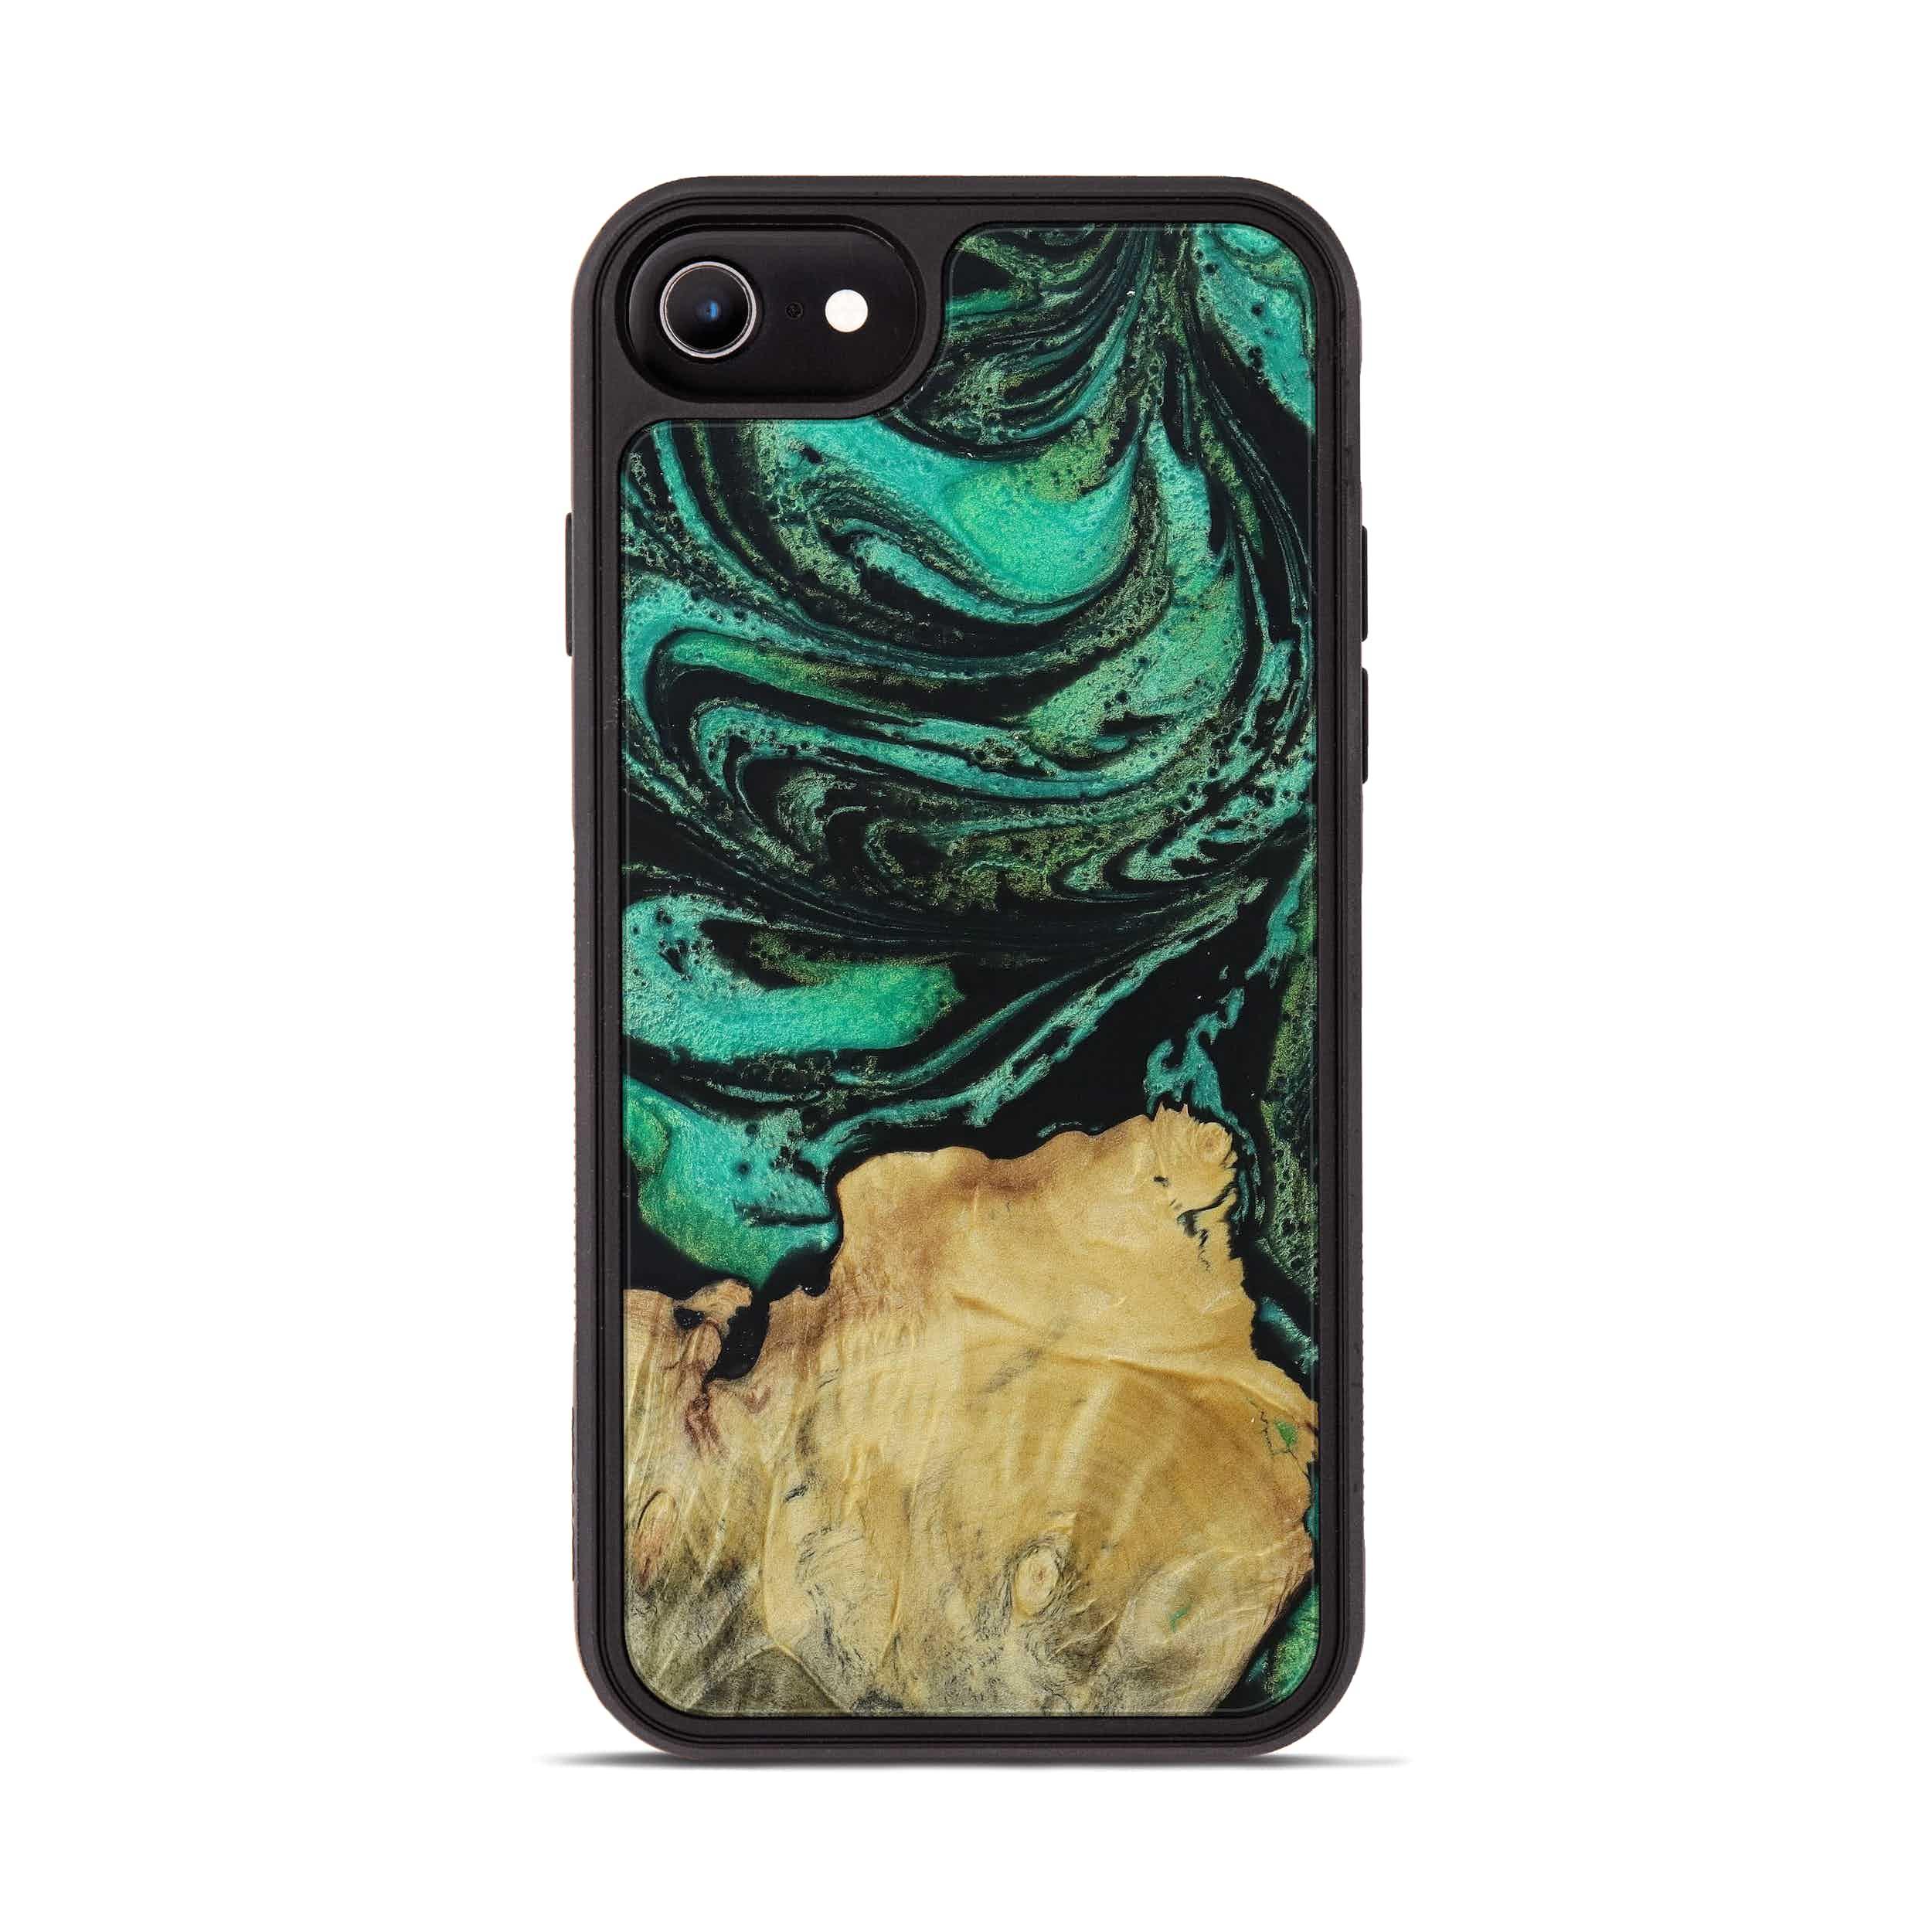 iPhone 6s Wood+Resin Phone Case - Miro (Dark Green, 395950)